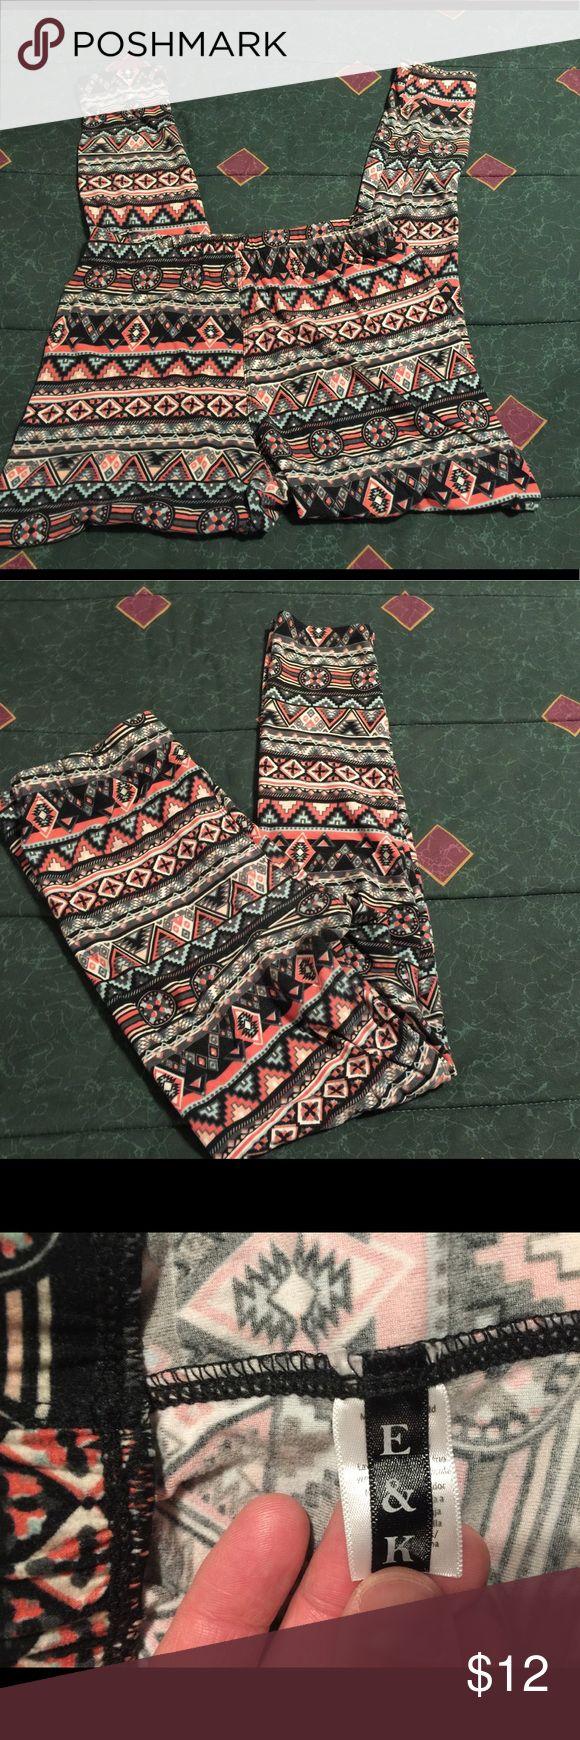 E&K Aztec Print Leggings Size XL-2X. E&K Aztec Print Leggings Size XL-2X. This is a great pair of Aztec Print leggings. They are very warm and soft. Please view all pictures. E&K Pants Leggings